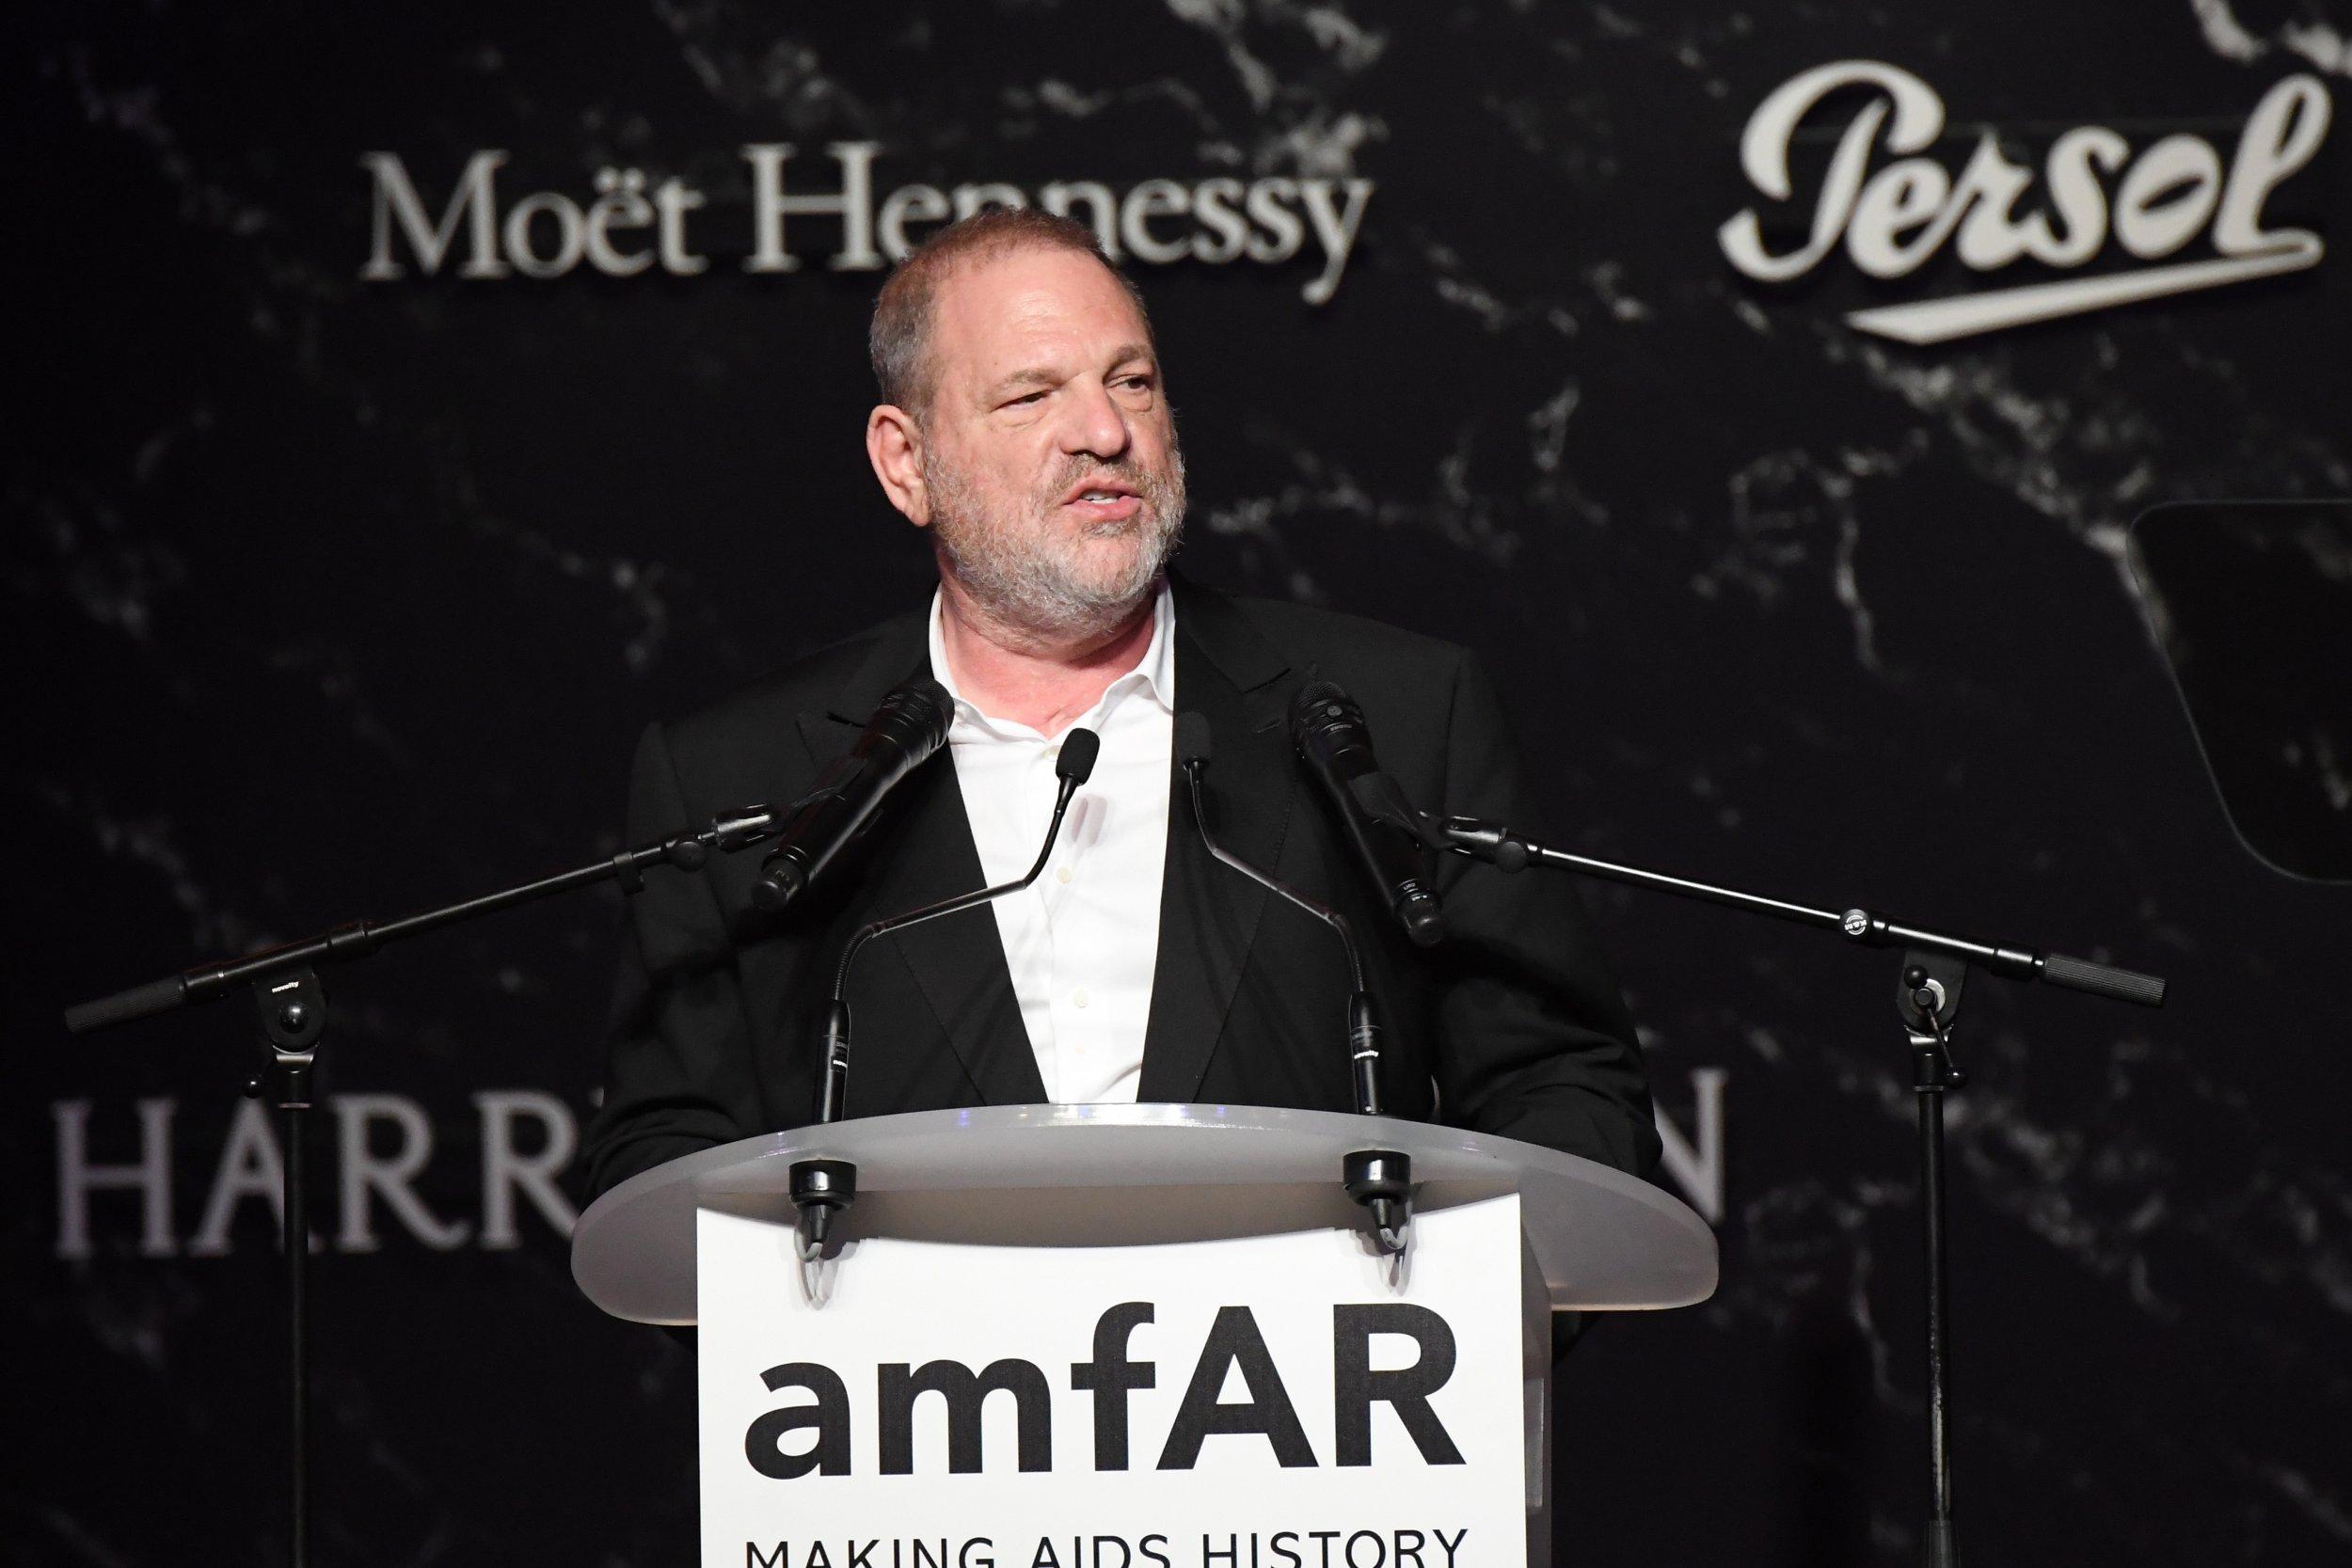 Harvey Weinstein NYPD audio recording released